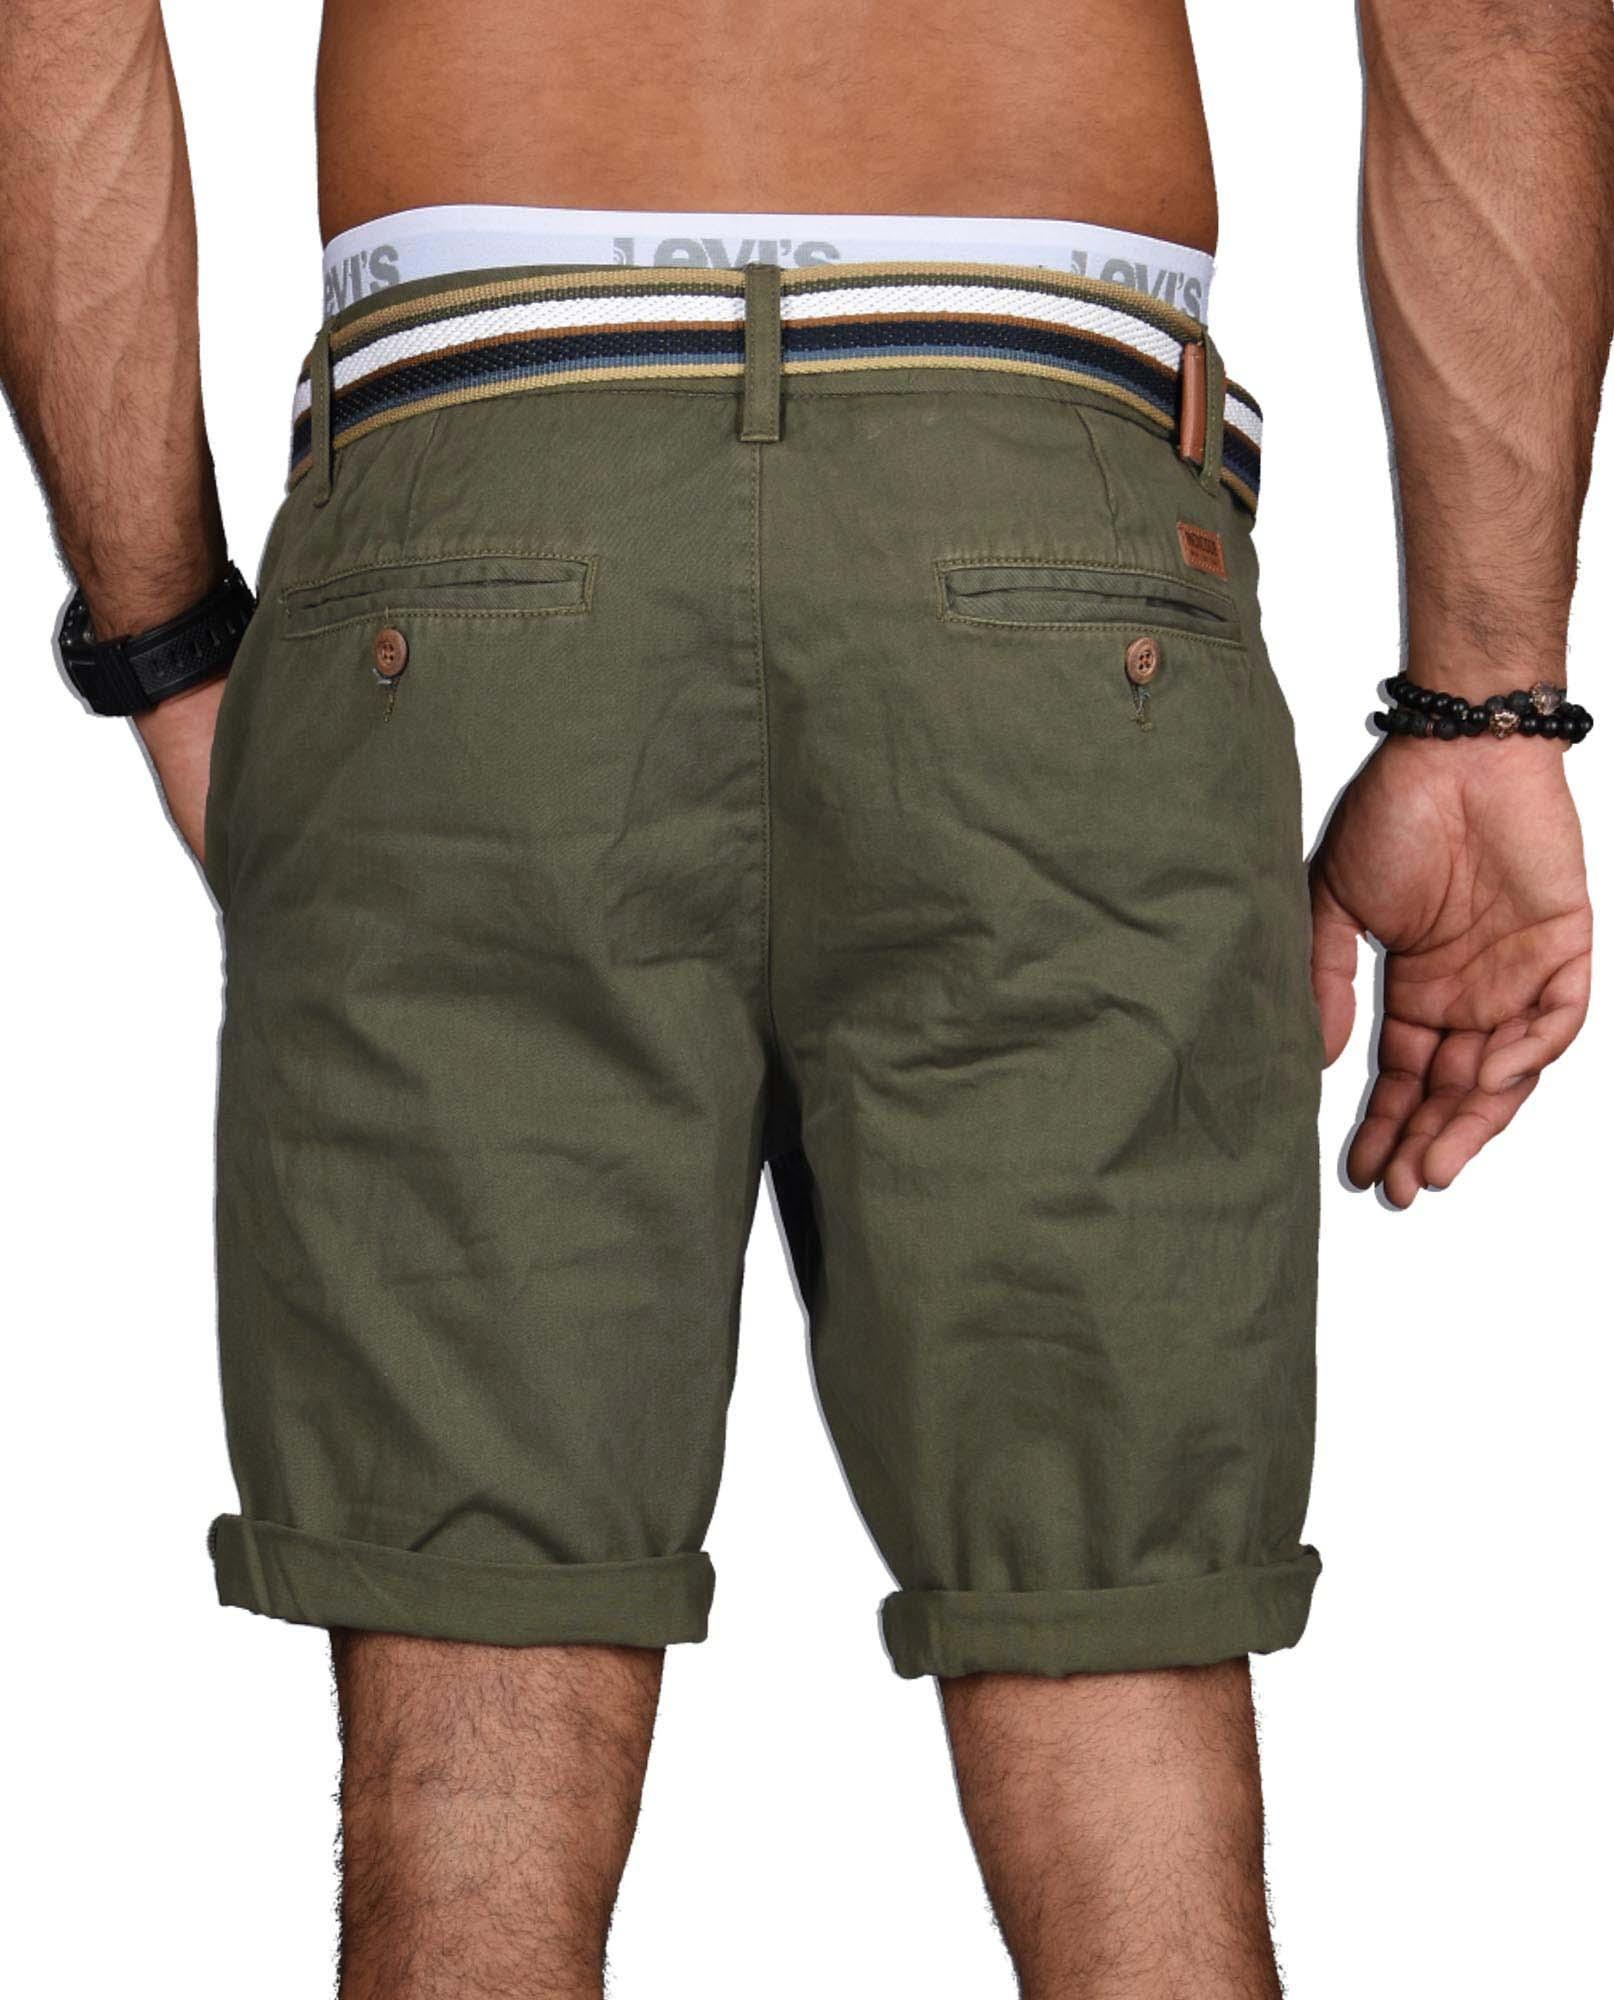 Indicode-Herren-Sommer-Bermuda-Chino-Shorts-kurze-Hose-Sommerhose-Short-NEU-B499 Indexbild 21